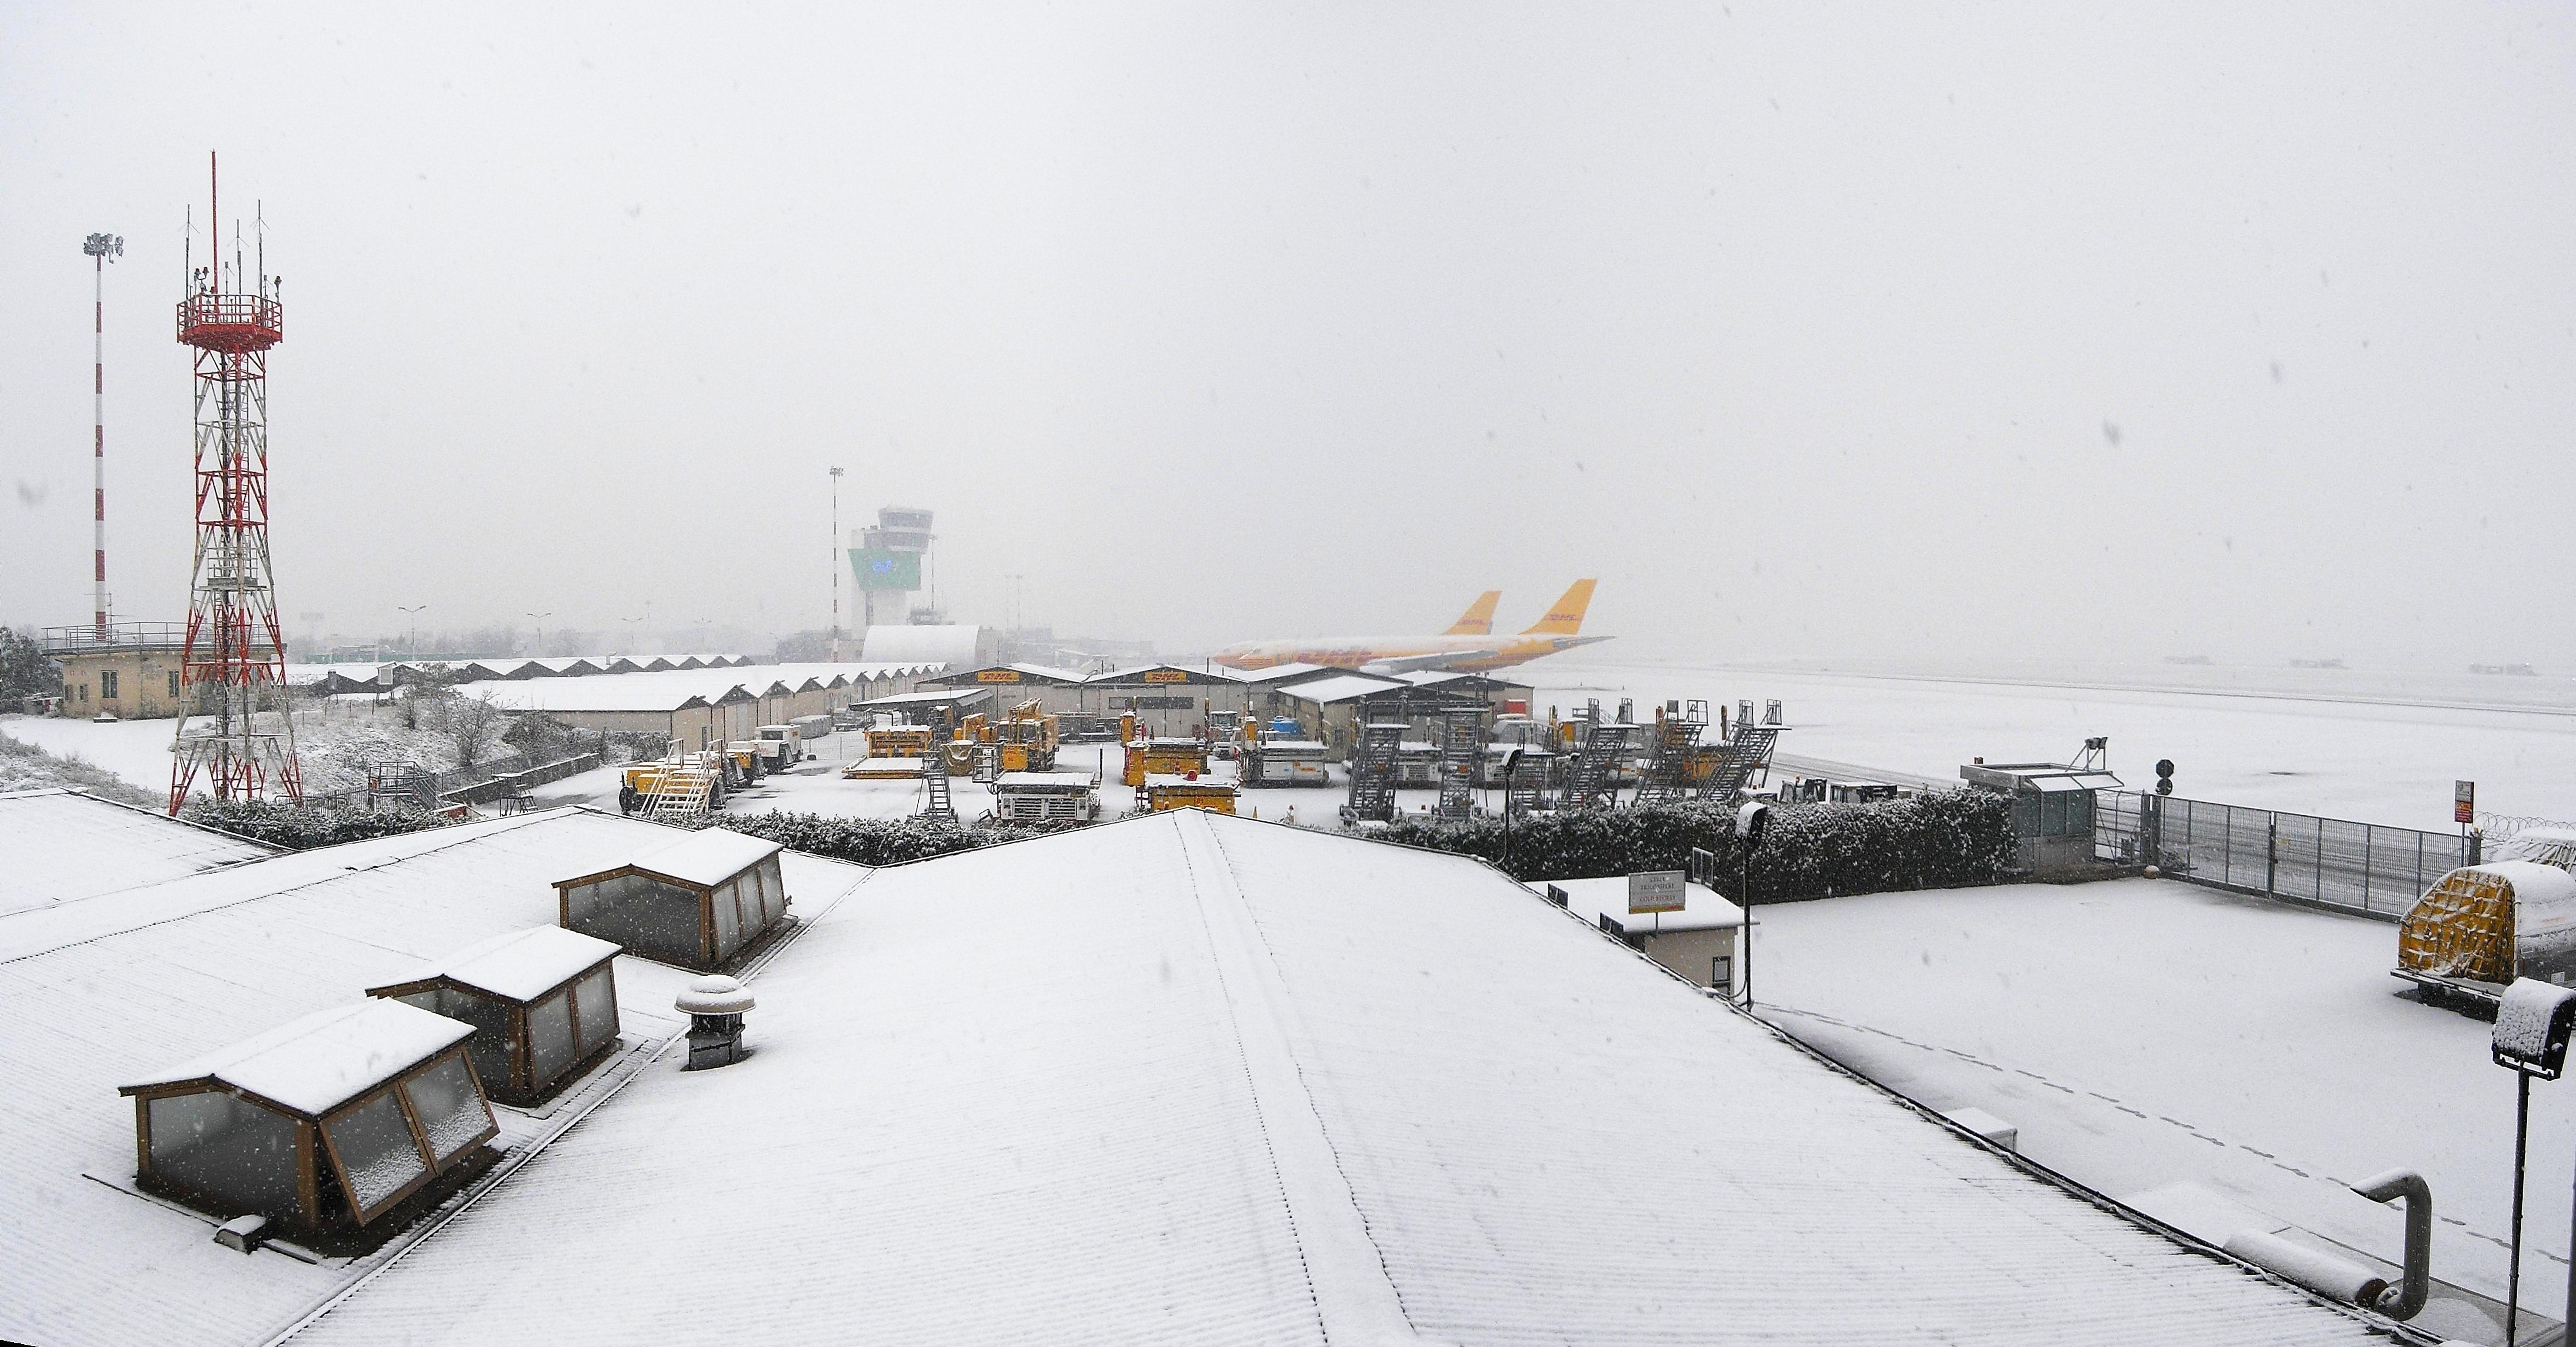 Aeroporto Orio Al Serio : Italy orio al serio airport stock photo alamy